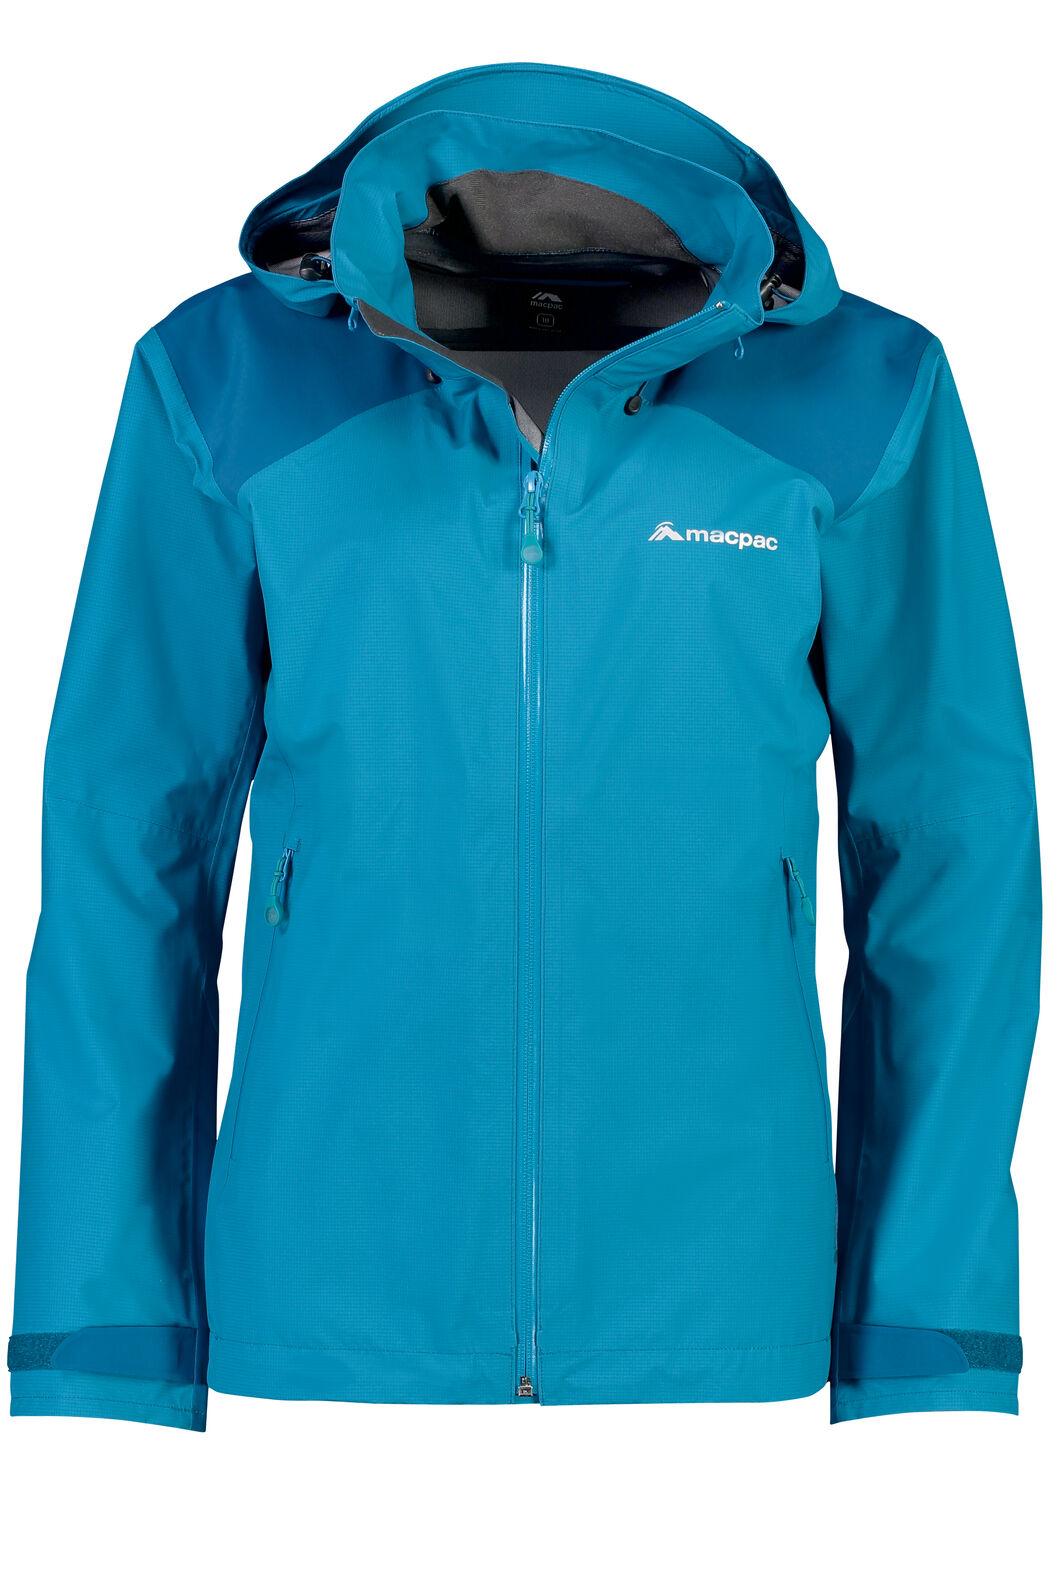 Macpac Traverse Pertex Shield® Rain Jacket - Women's, Enamel Blue, hi-res